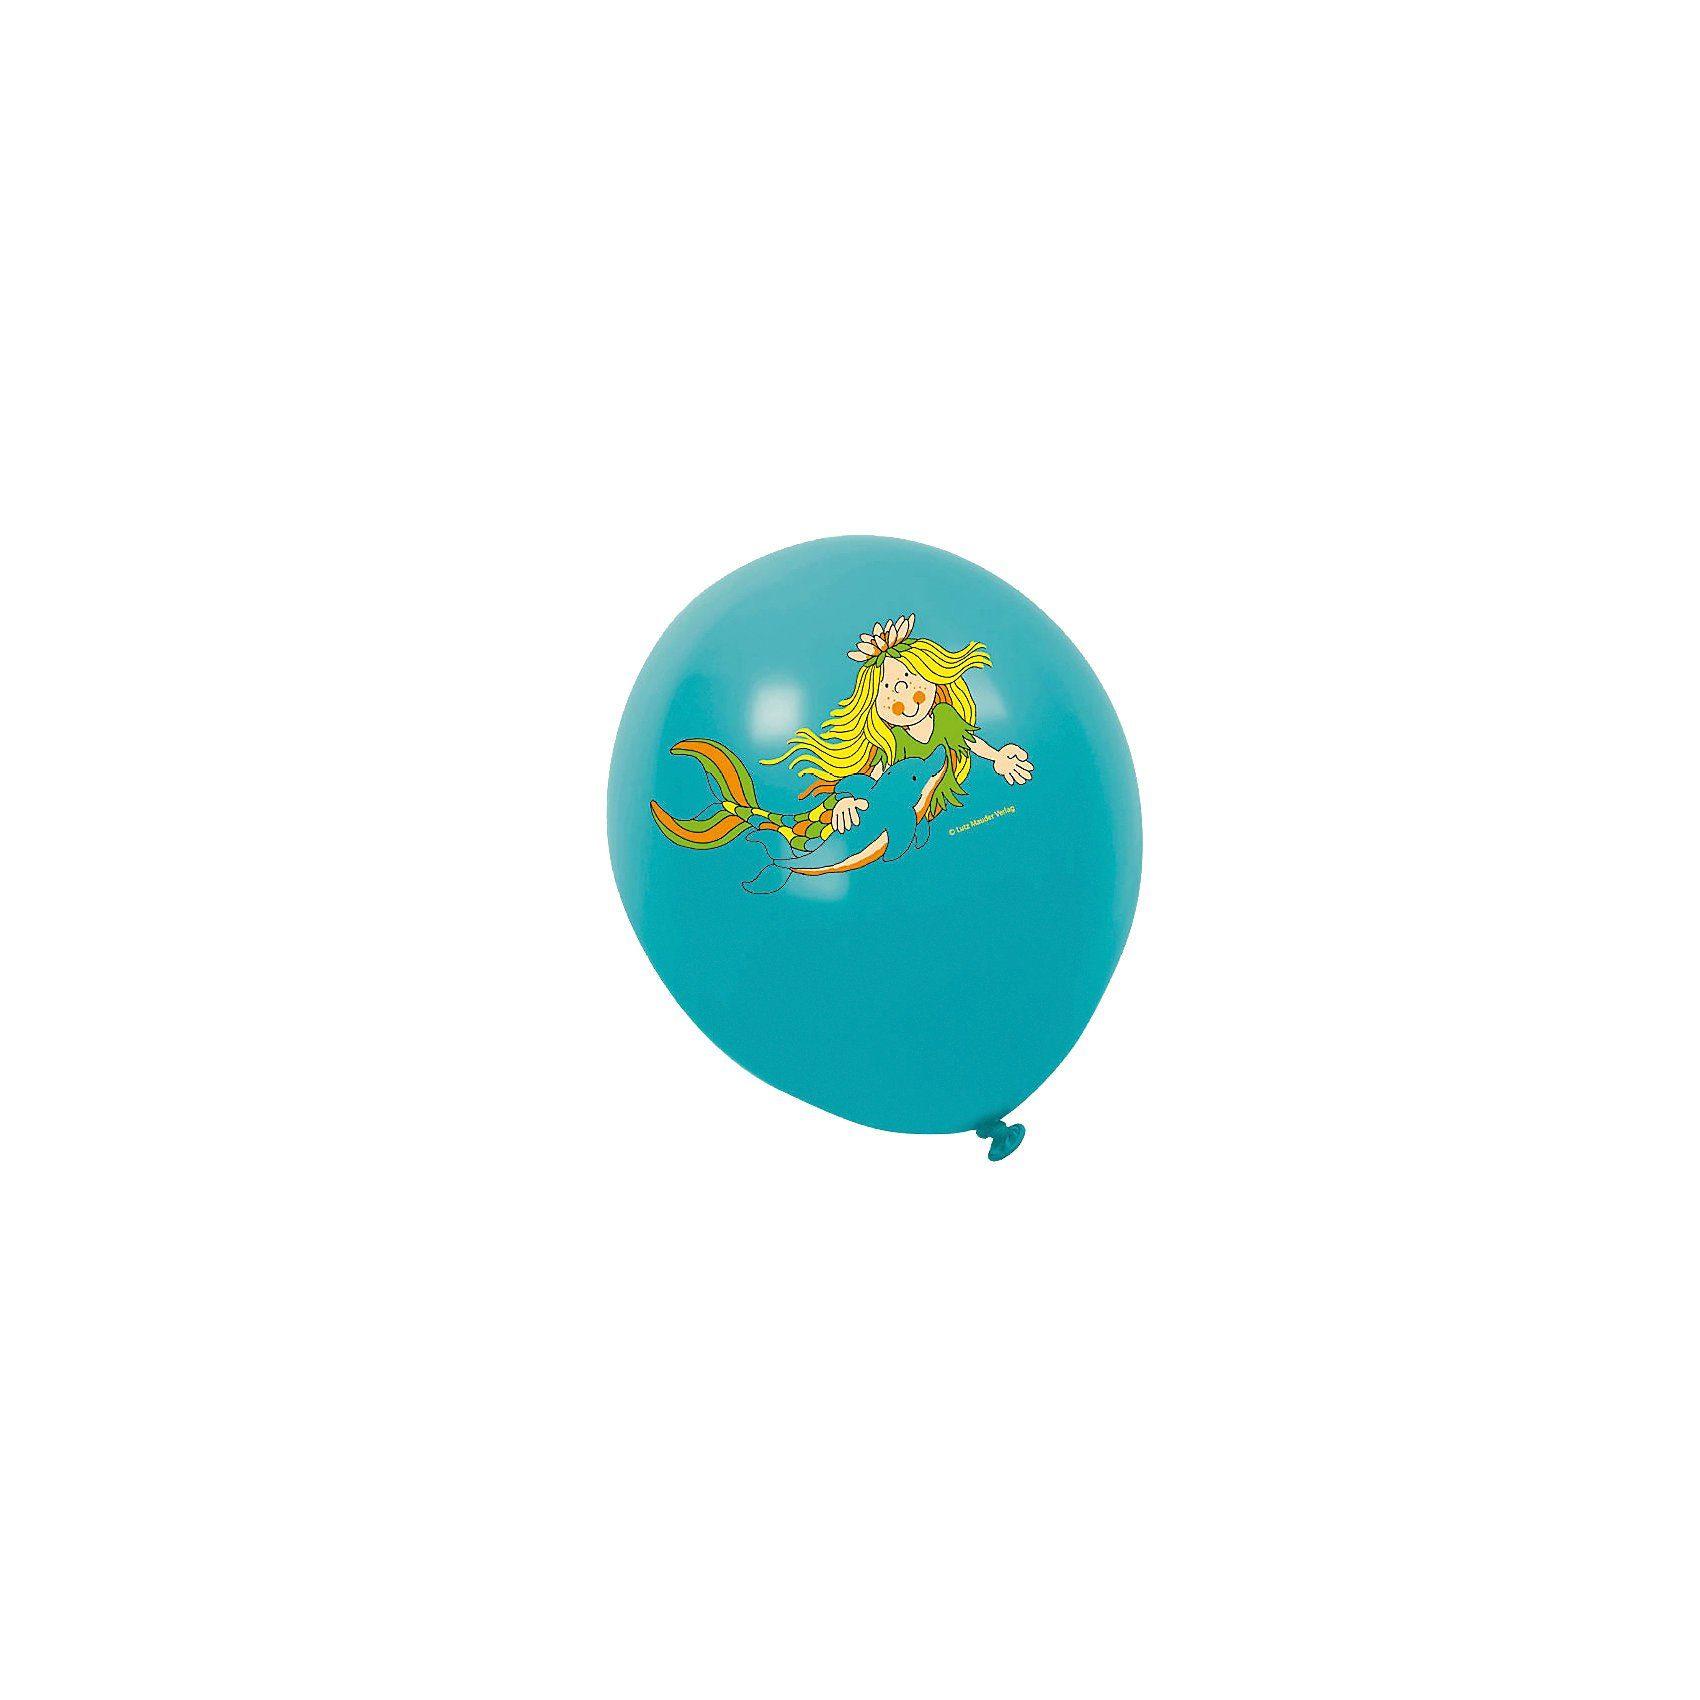 Lutz Mauder Verlag Luftballons Nixe Sina Seestern, 8-tlg.